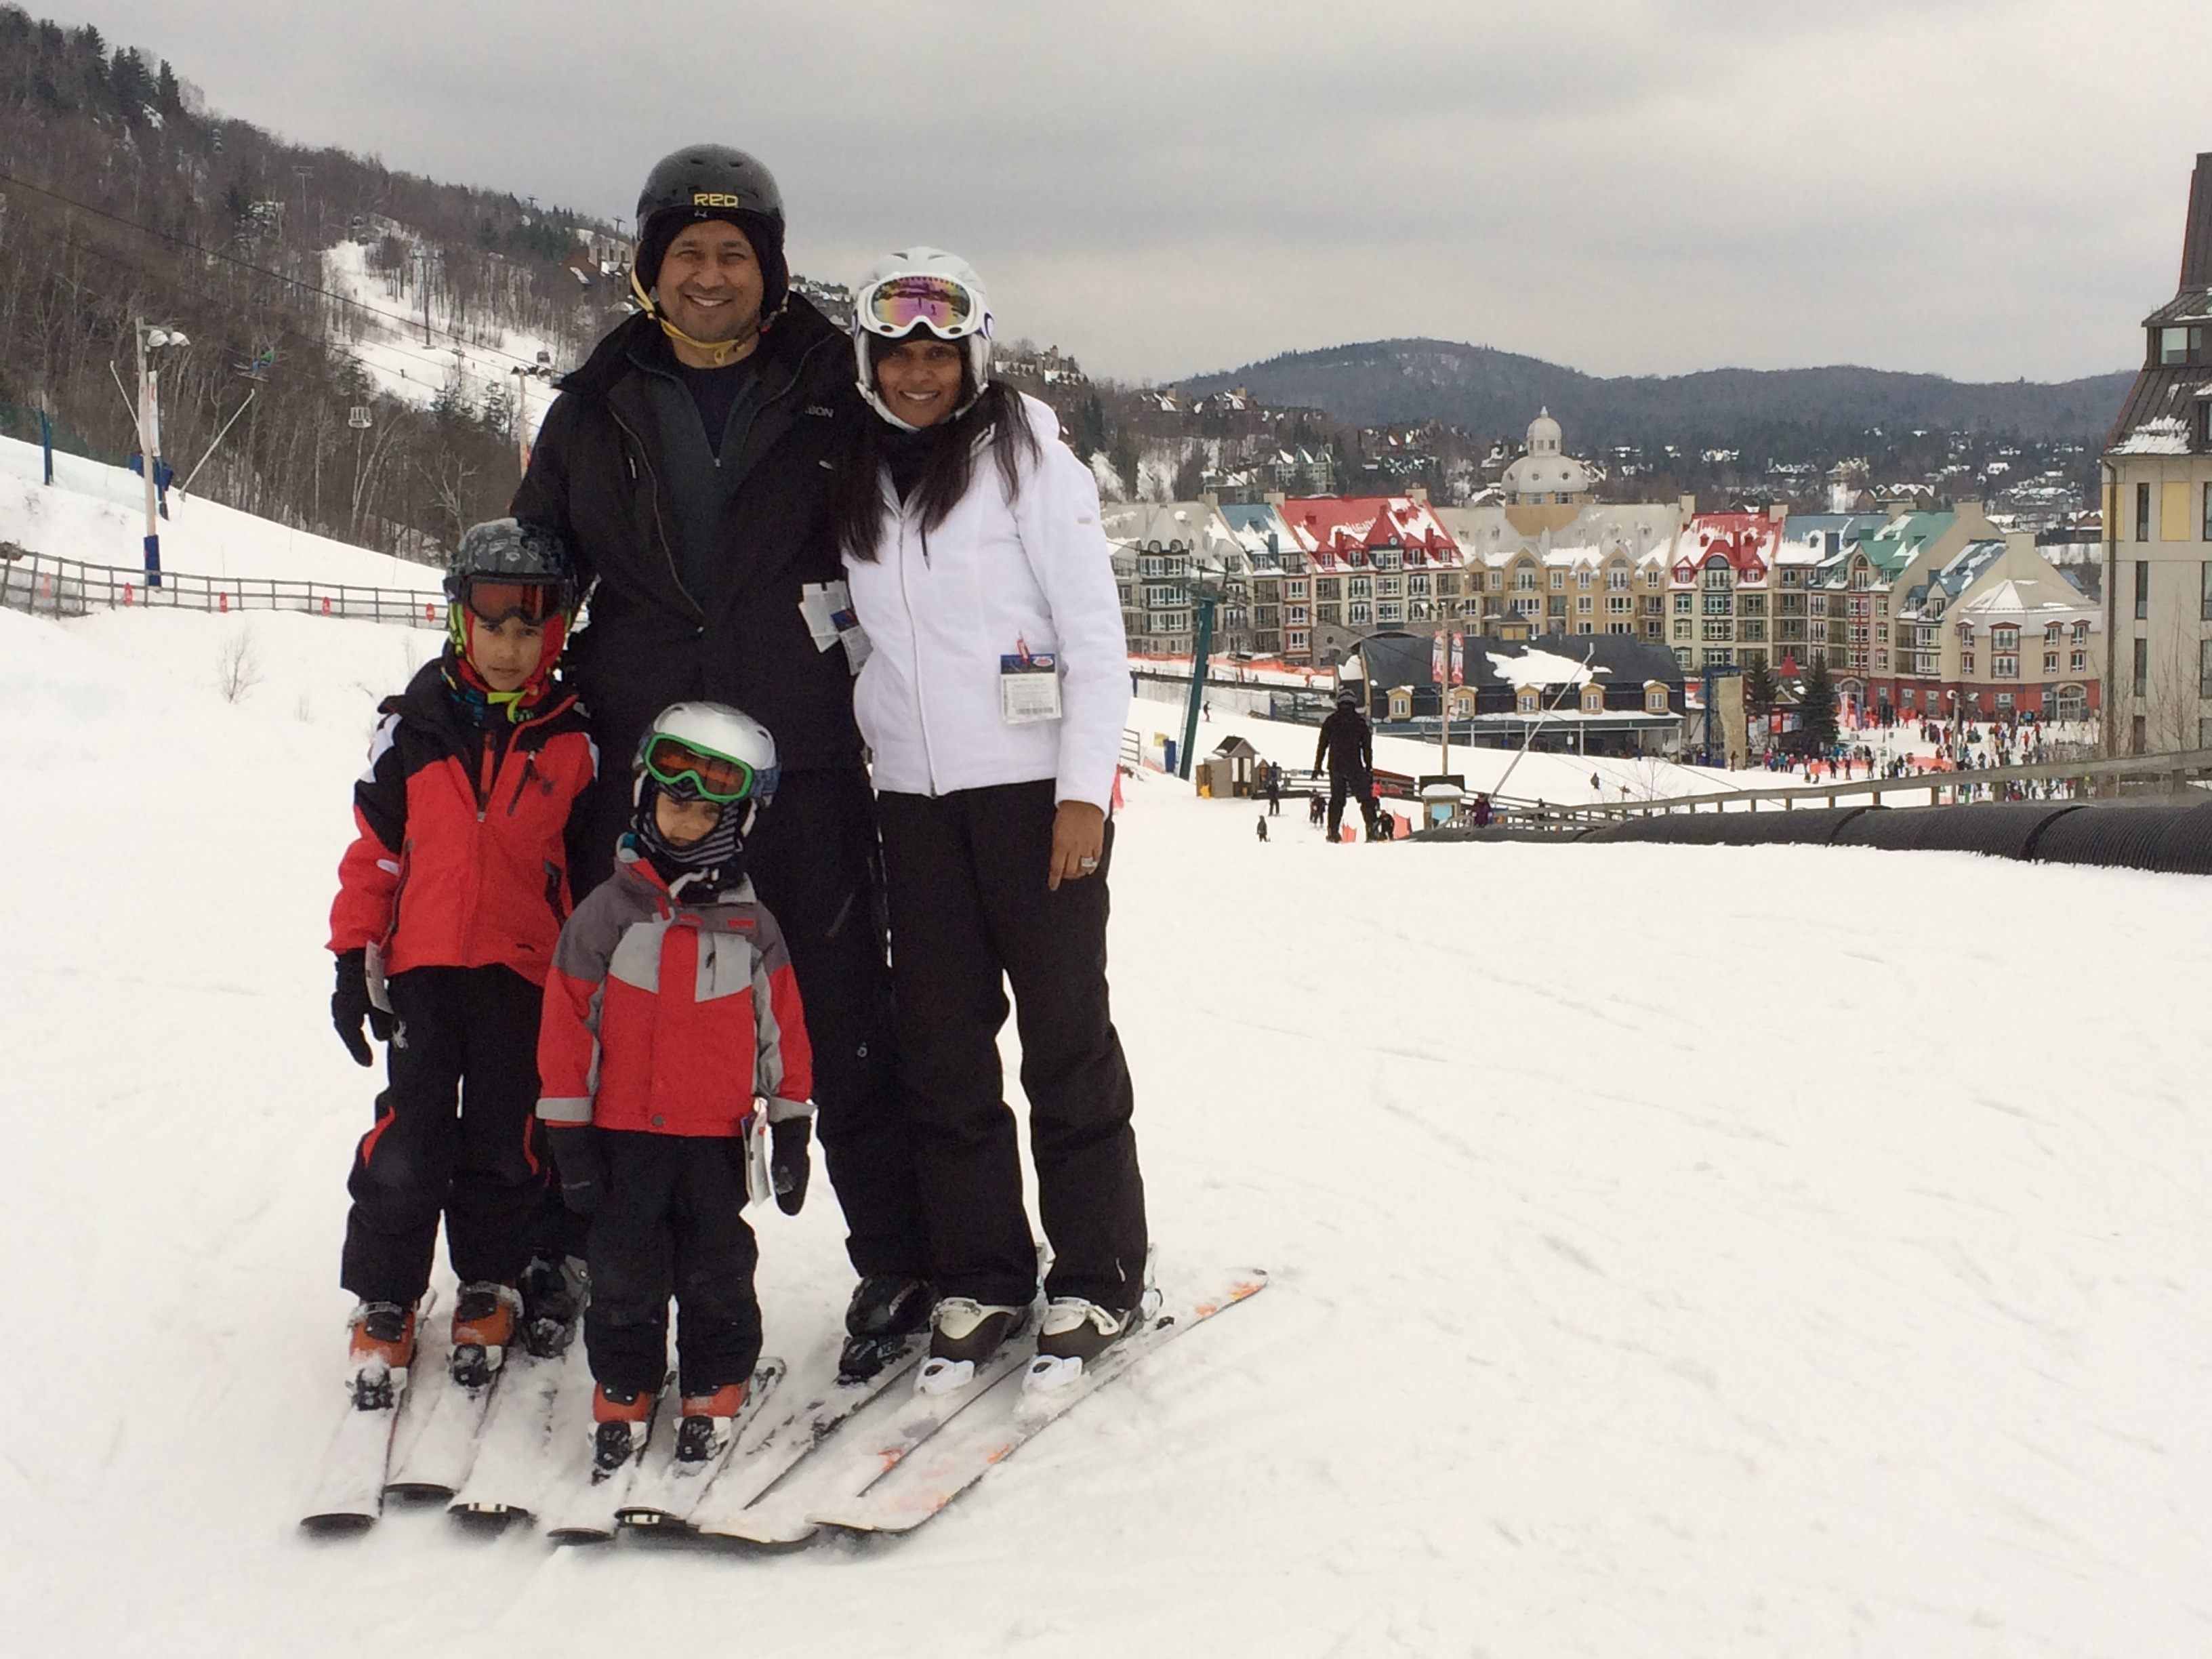 To Ski or Not to Ski this March Break